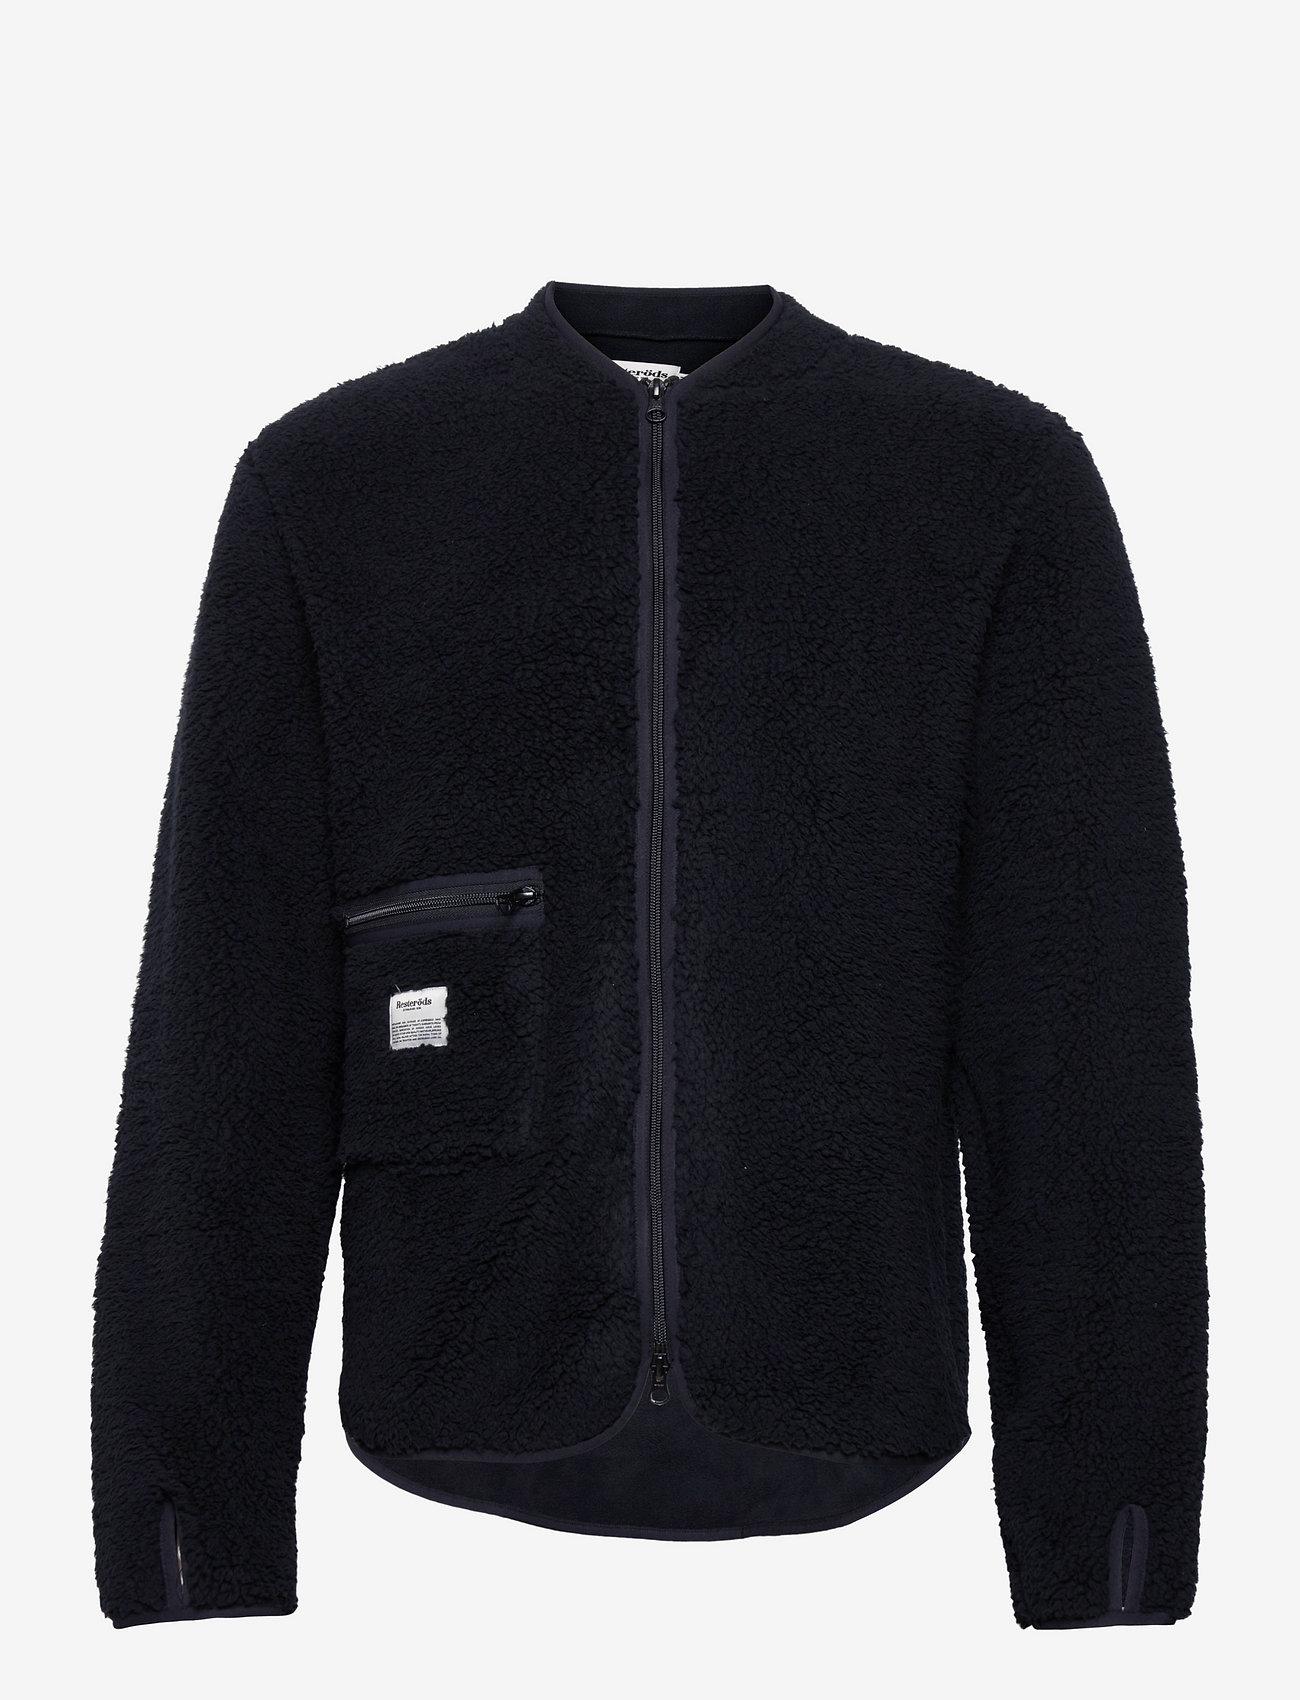 Resteröds - Original Fleece Jacket Recycle - basic-sweatshirts - svart - 0